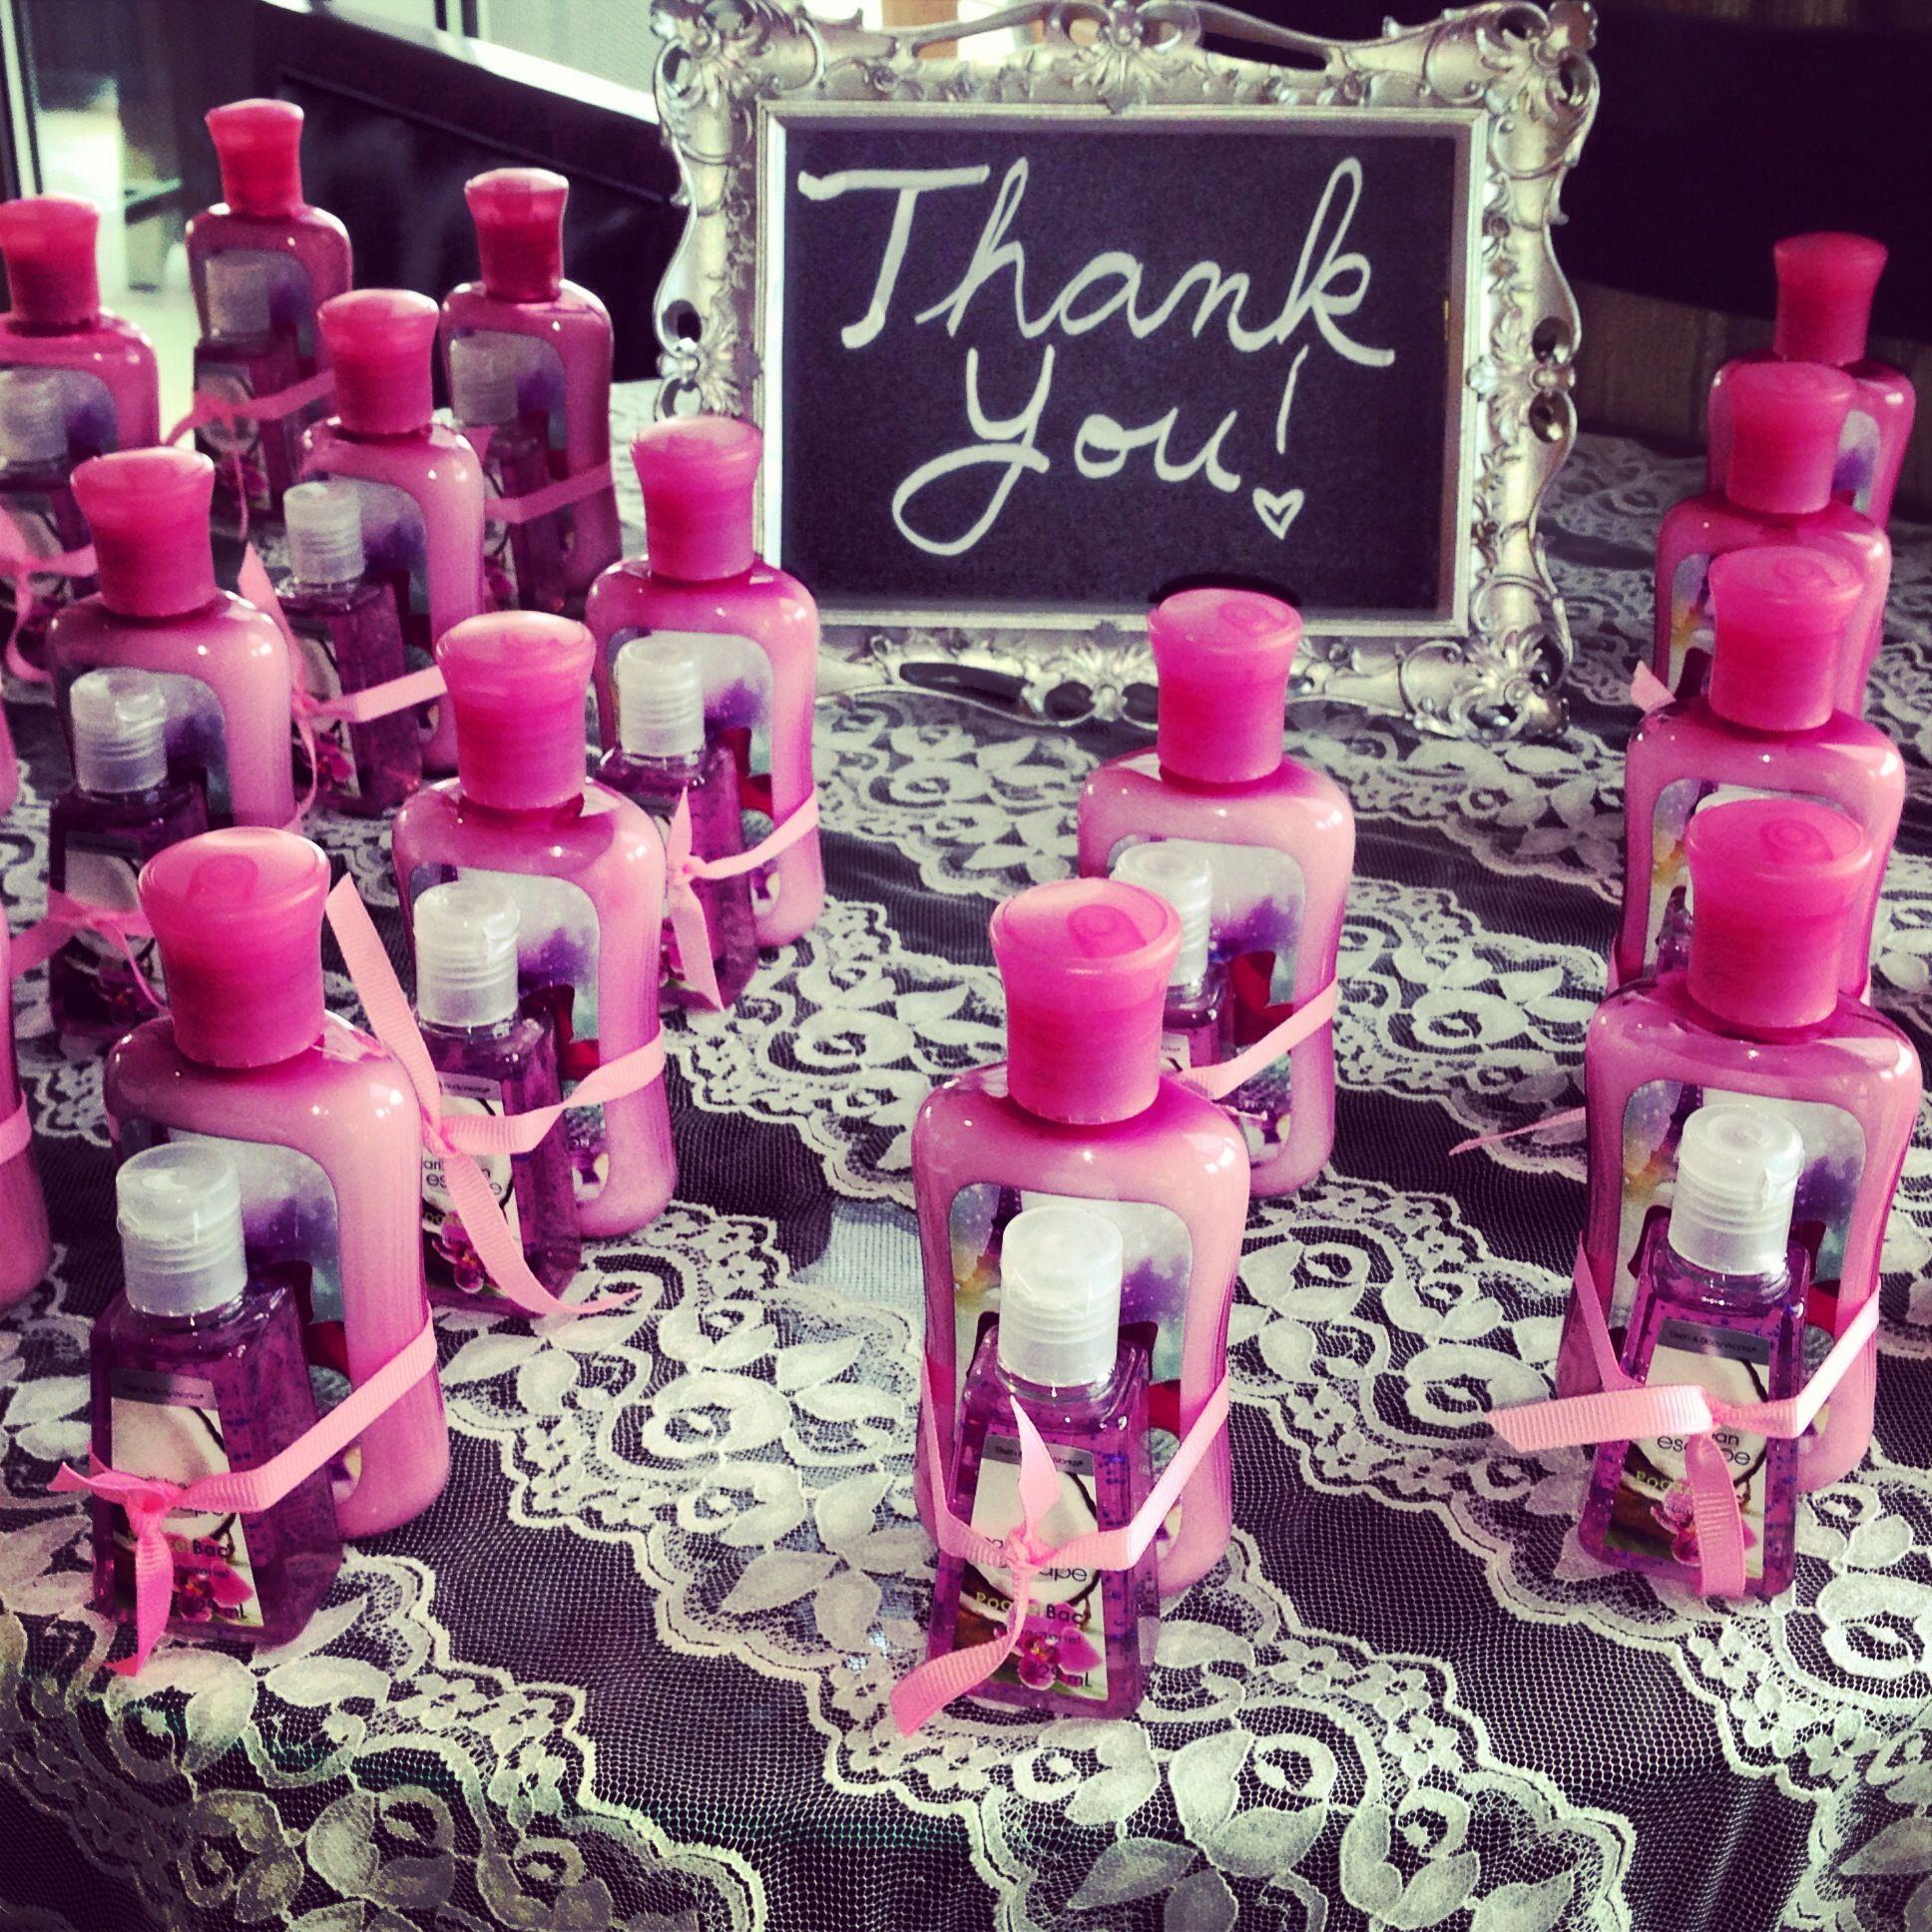 Best 25 Bridal shower favors ideas on Pinterest  Bridal shower planning Bridal shower party